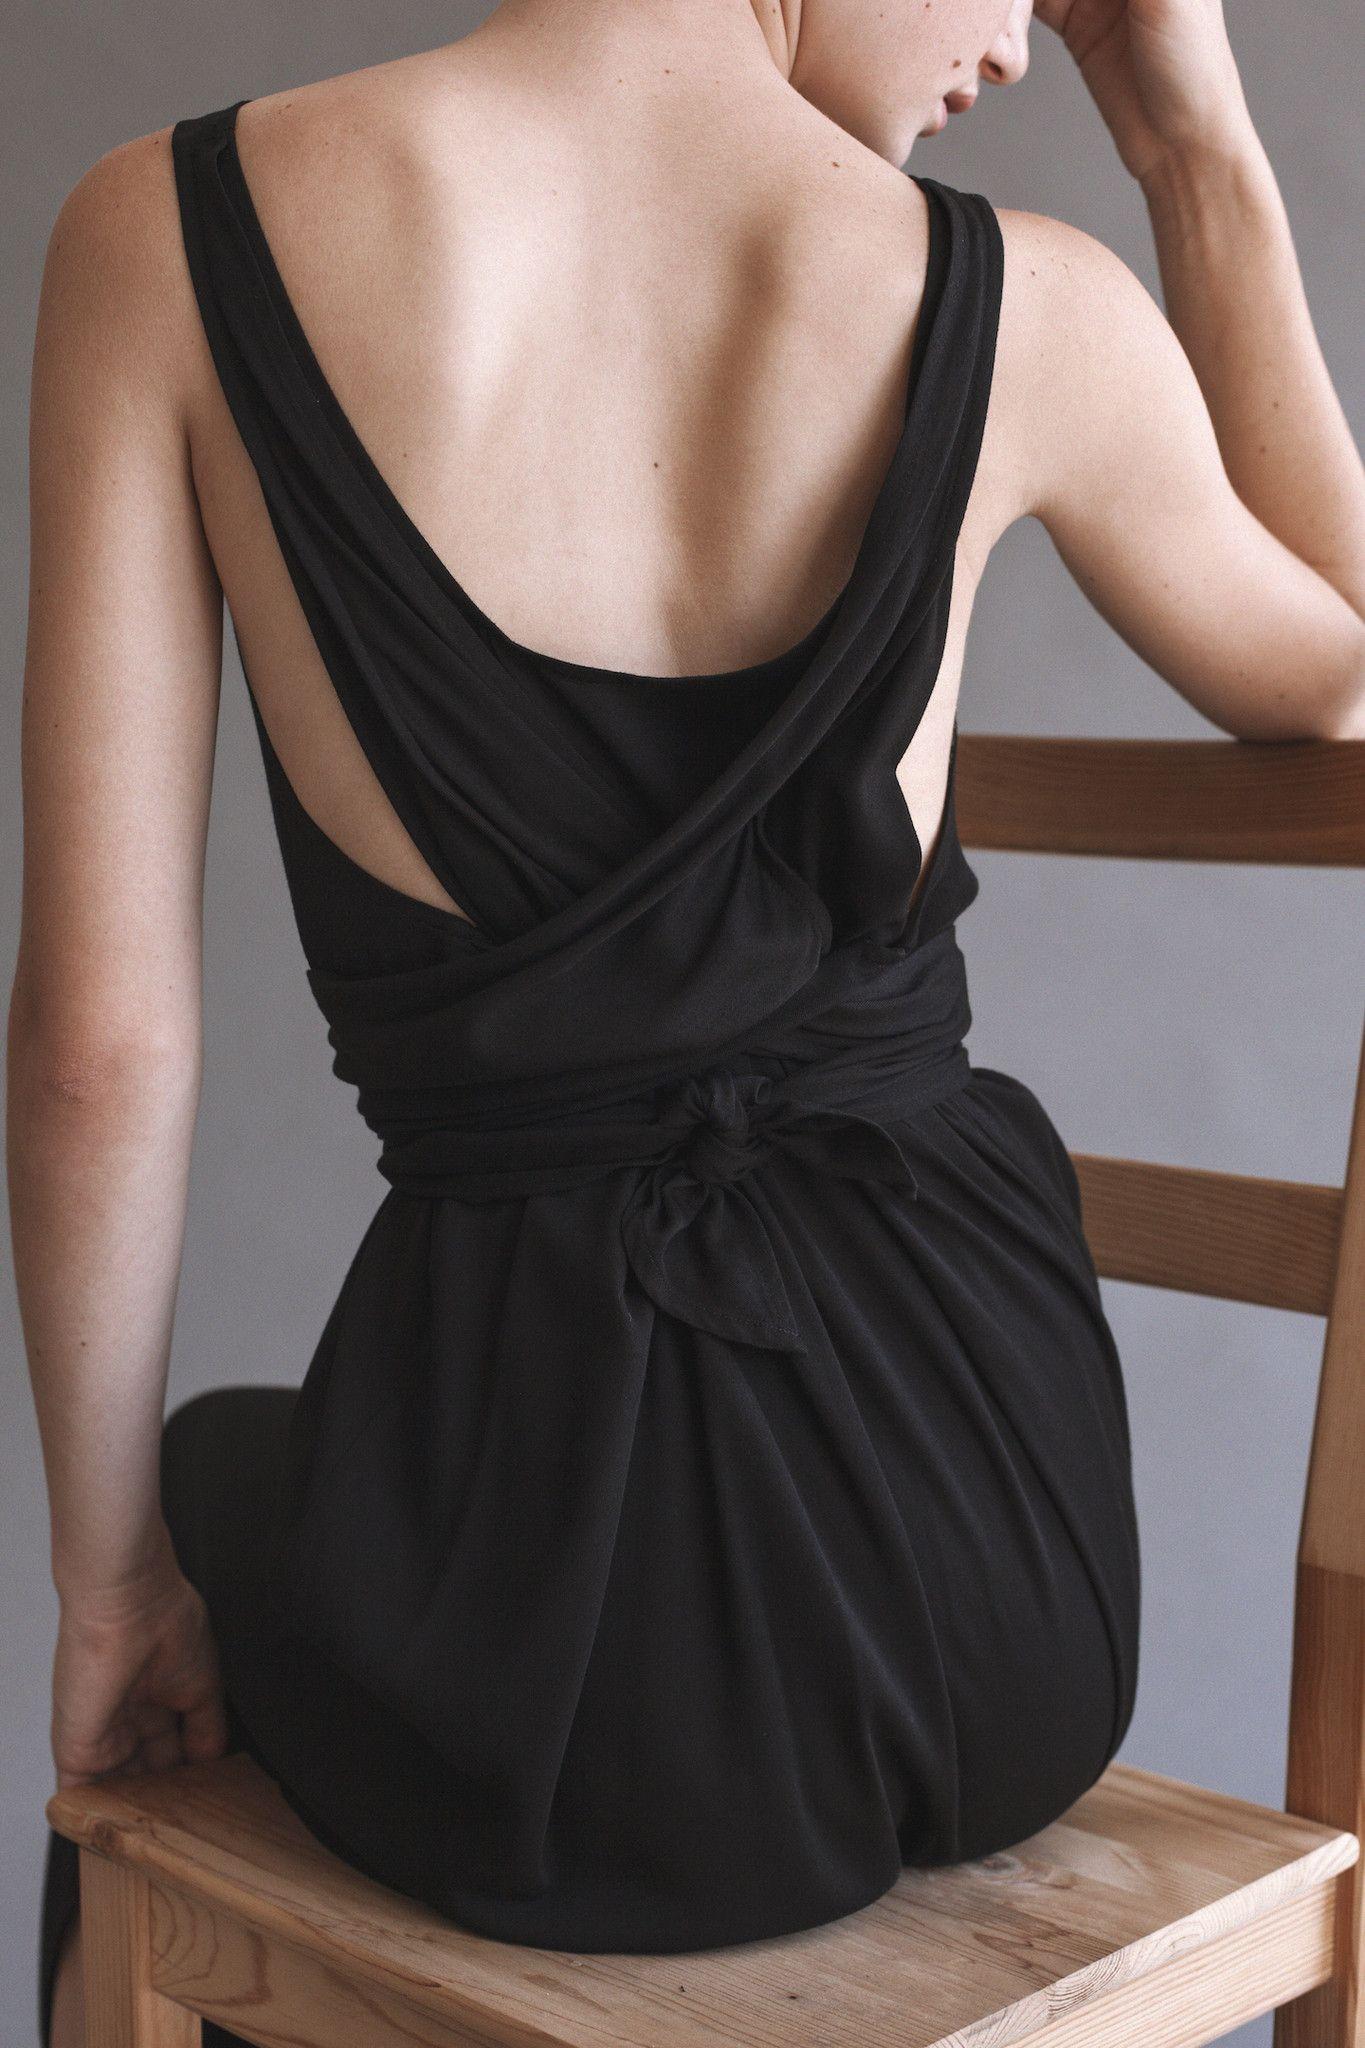 Tie dress contemporary fashion fashion details and black tie